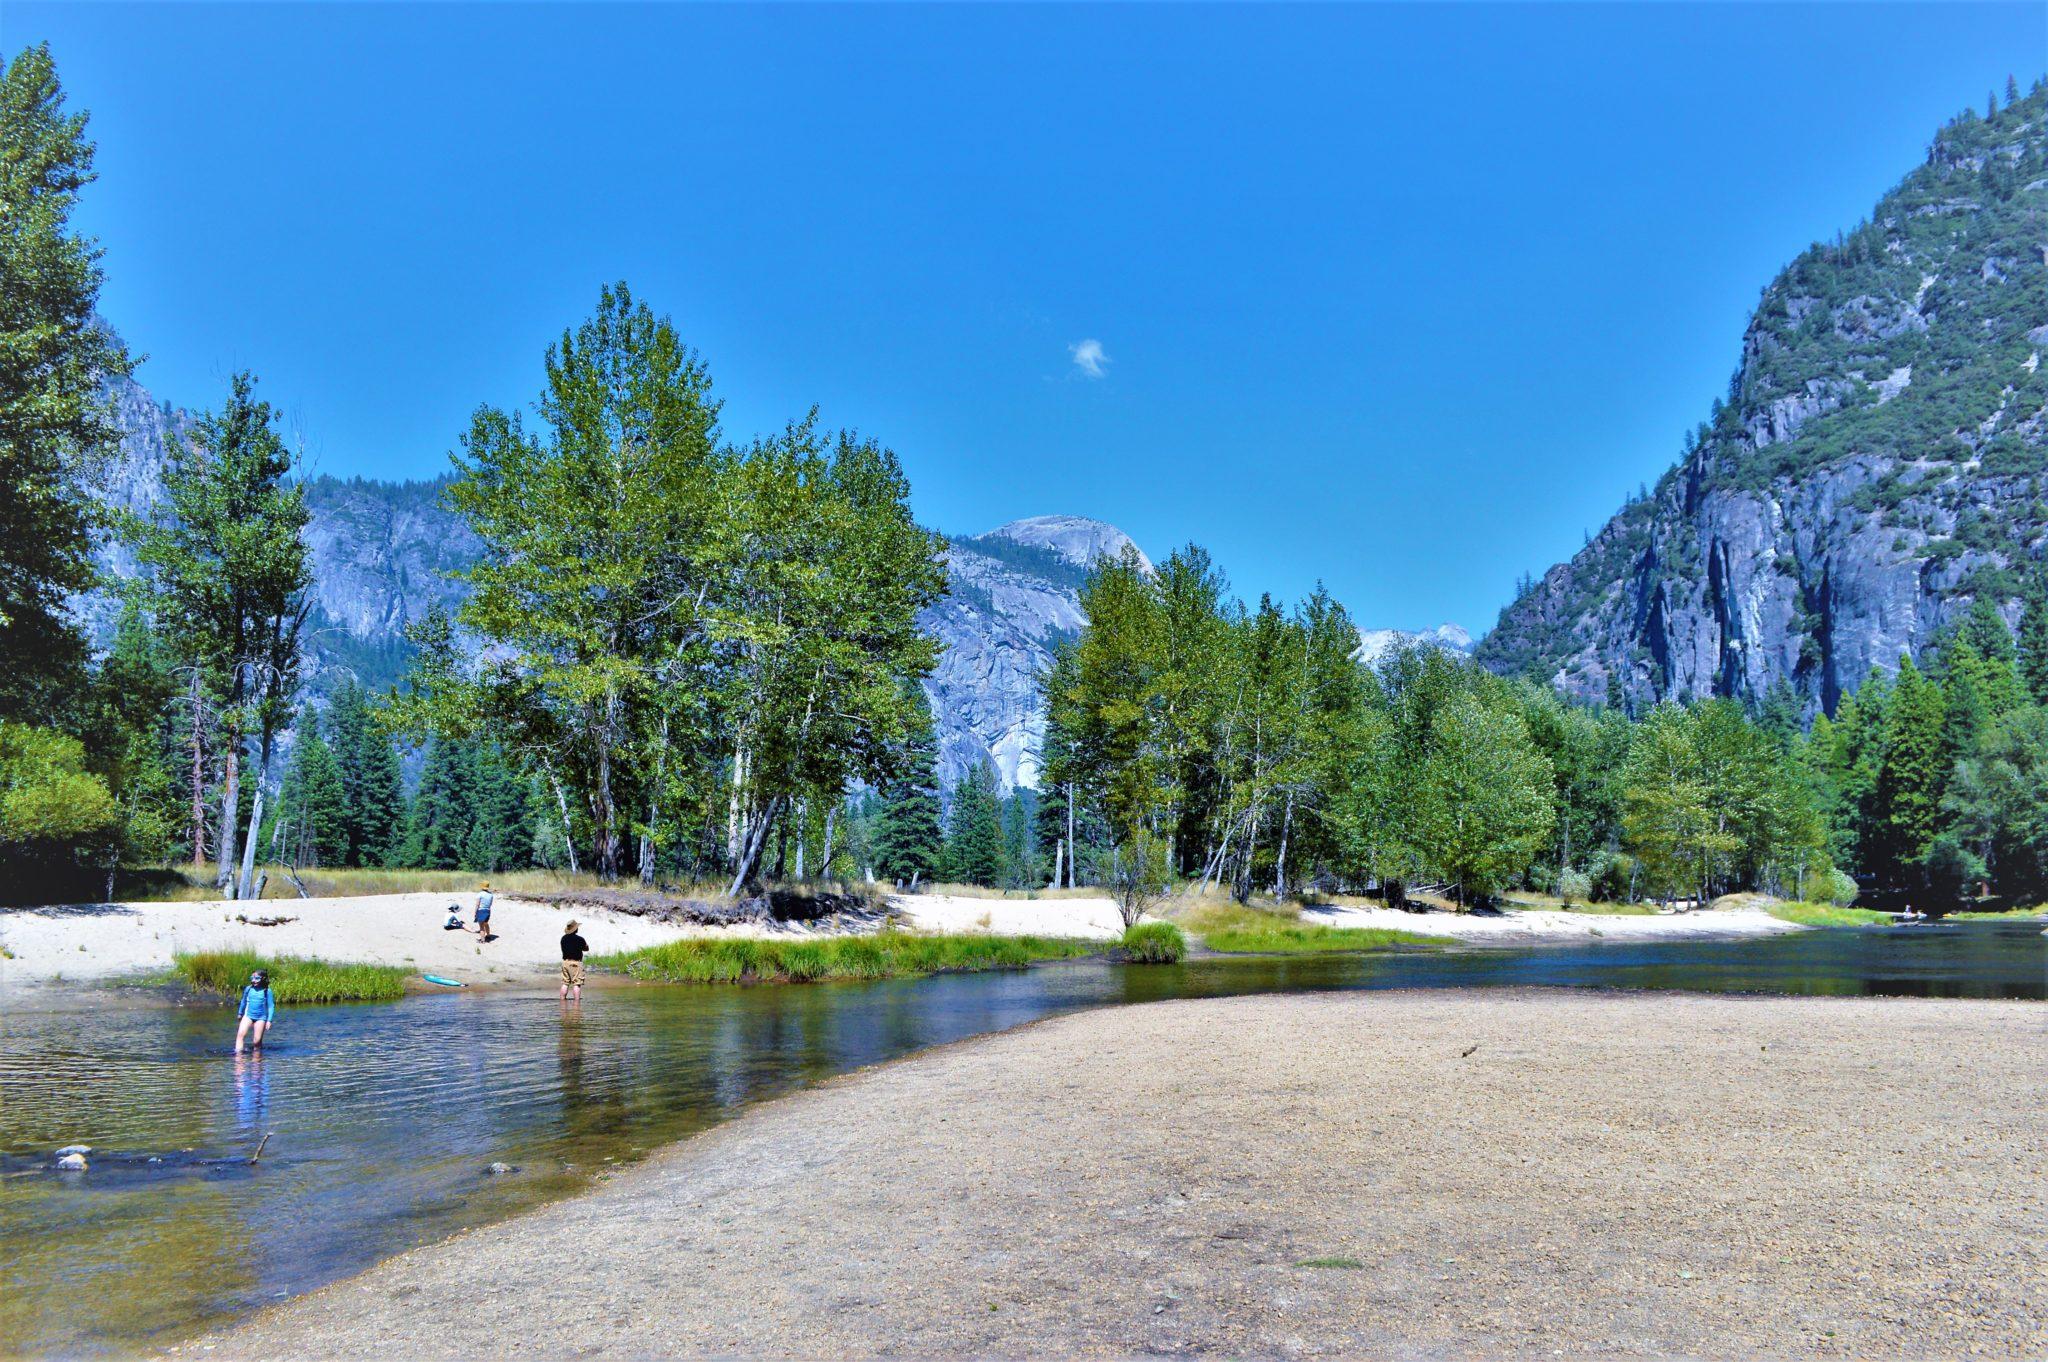 Swimming at Lake, Yosemite National Park, California